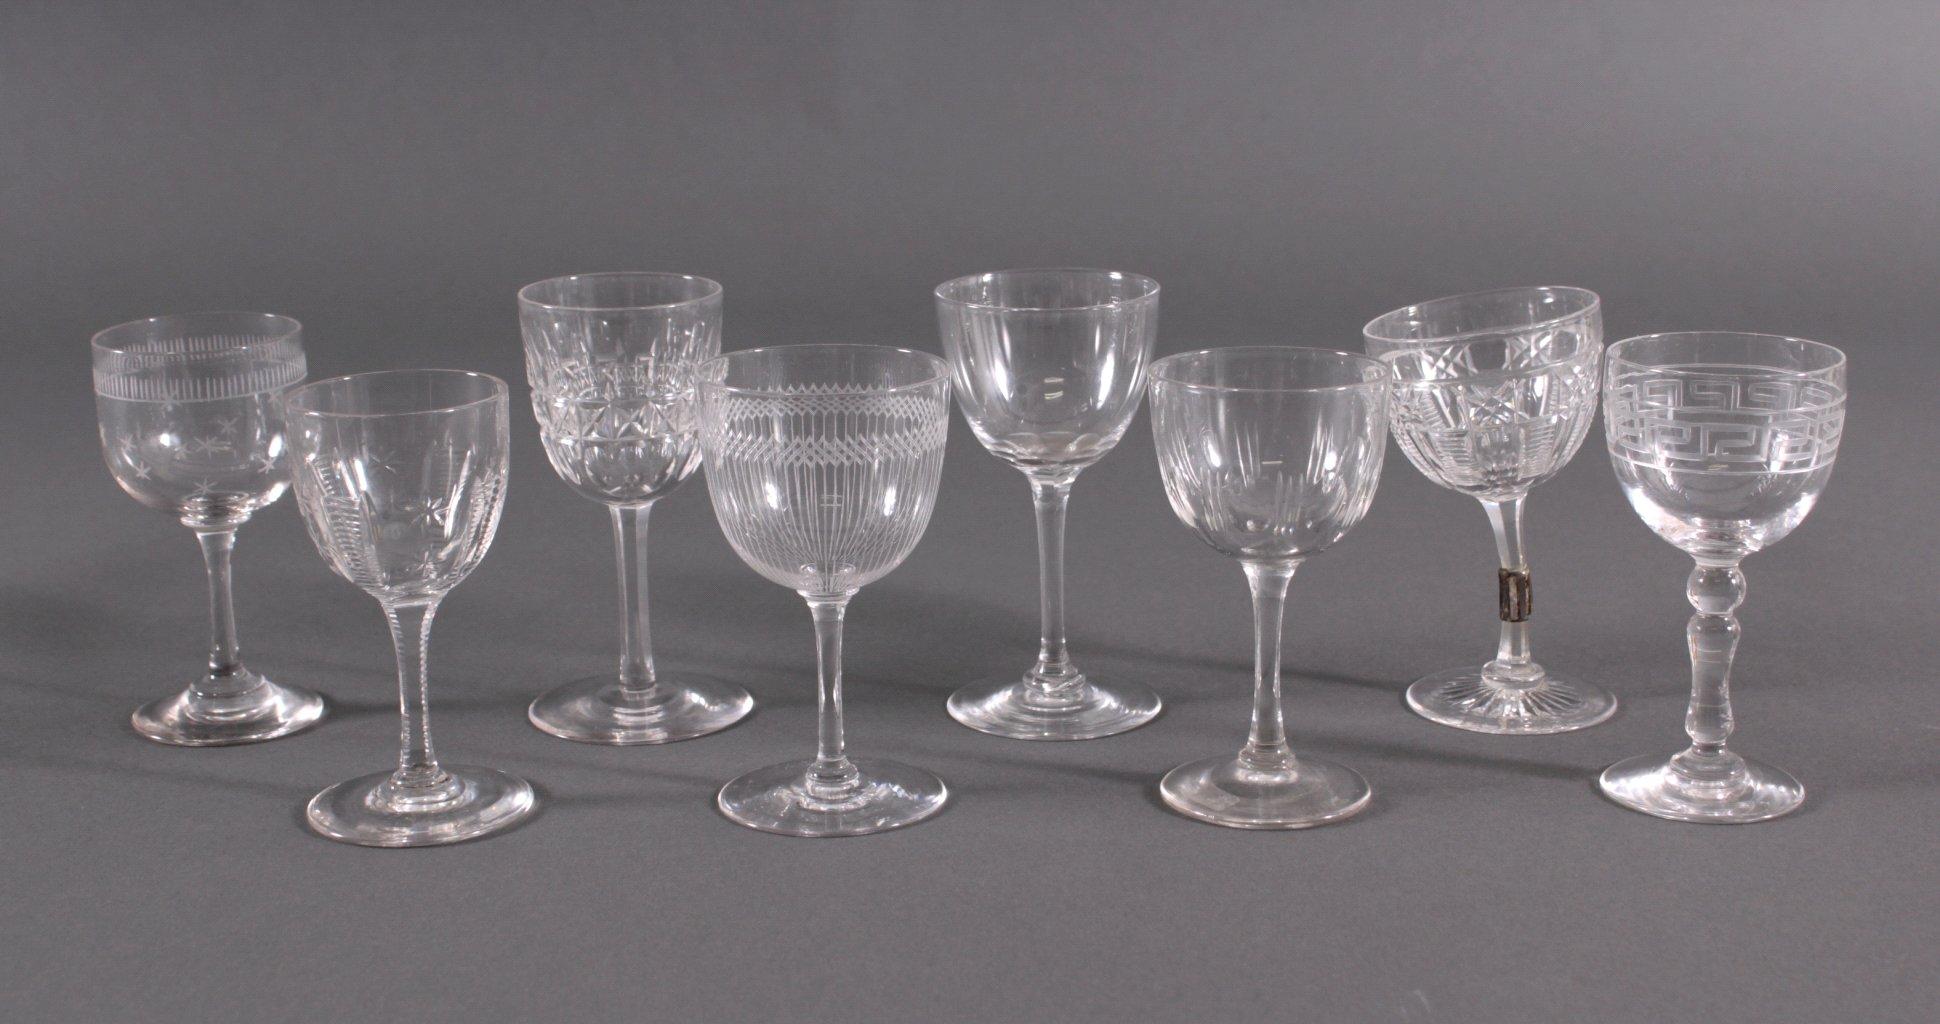 Acht diverse Gläser, 19./20. Jh.